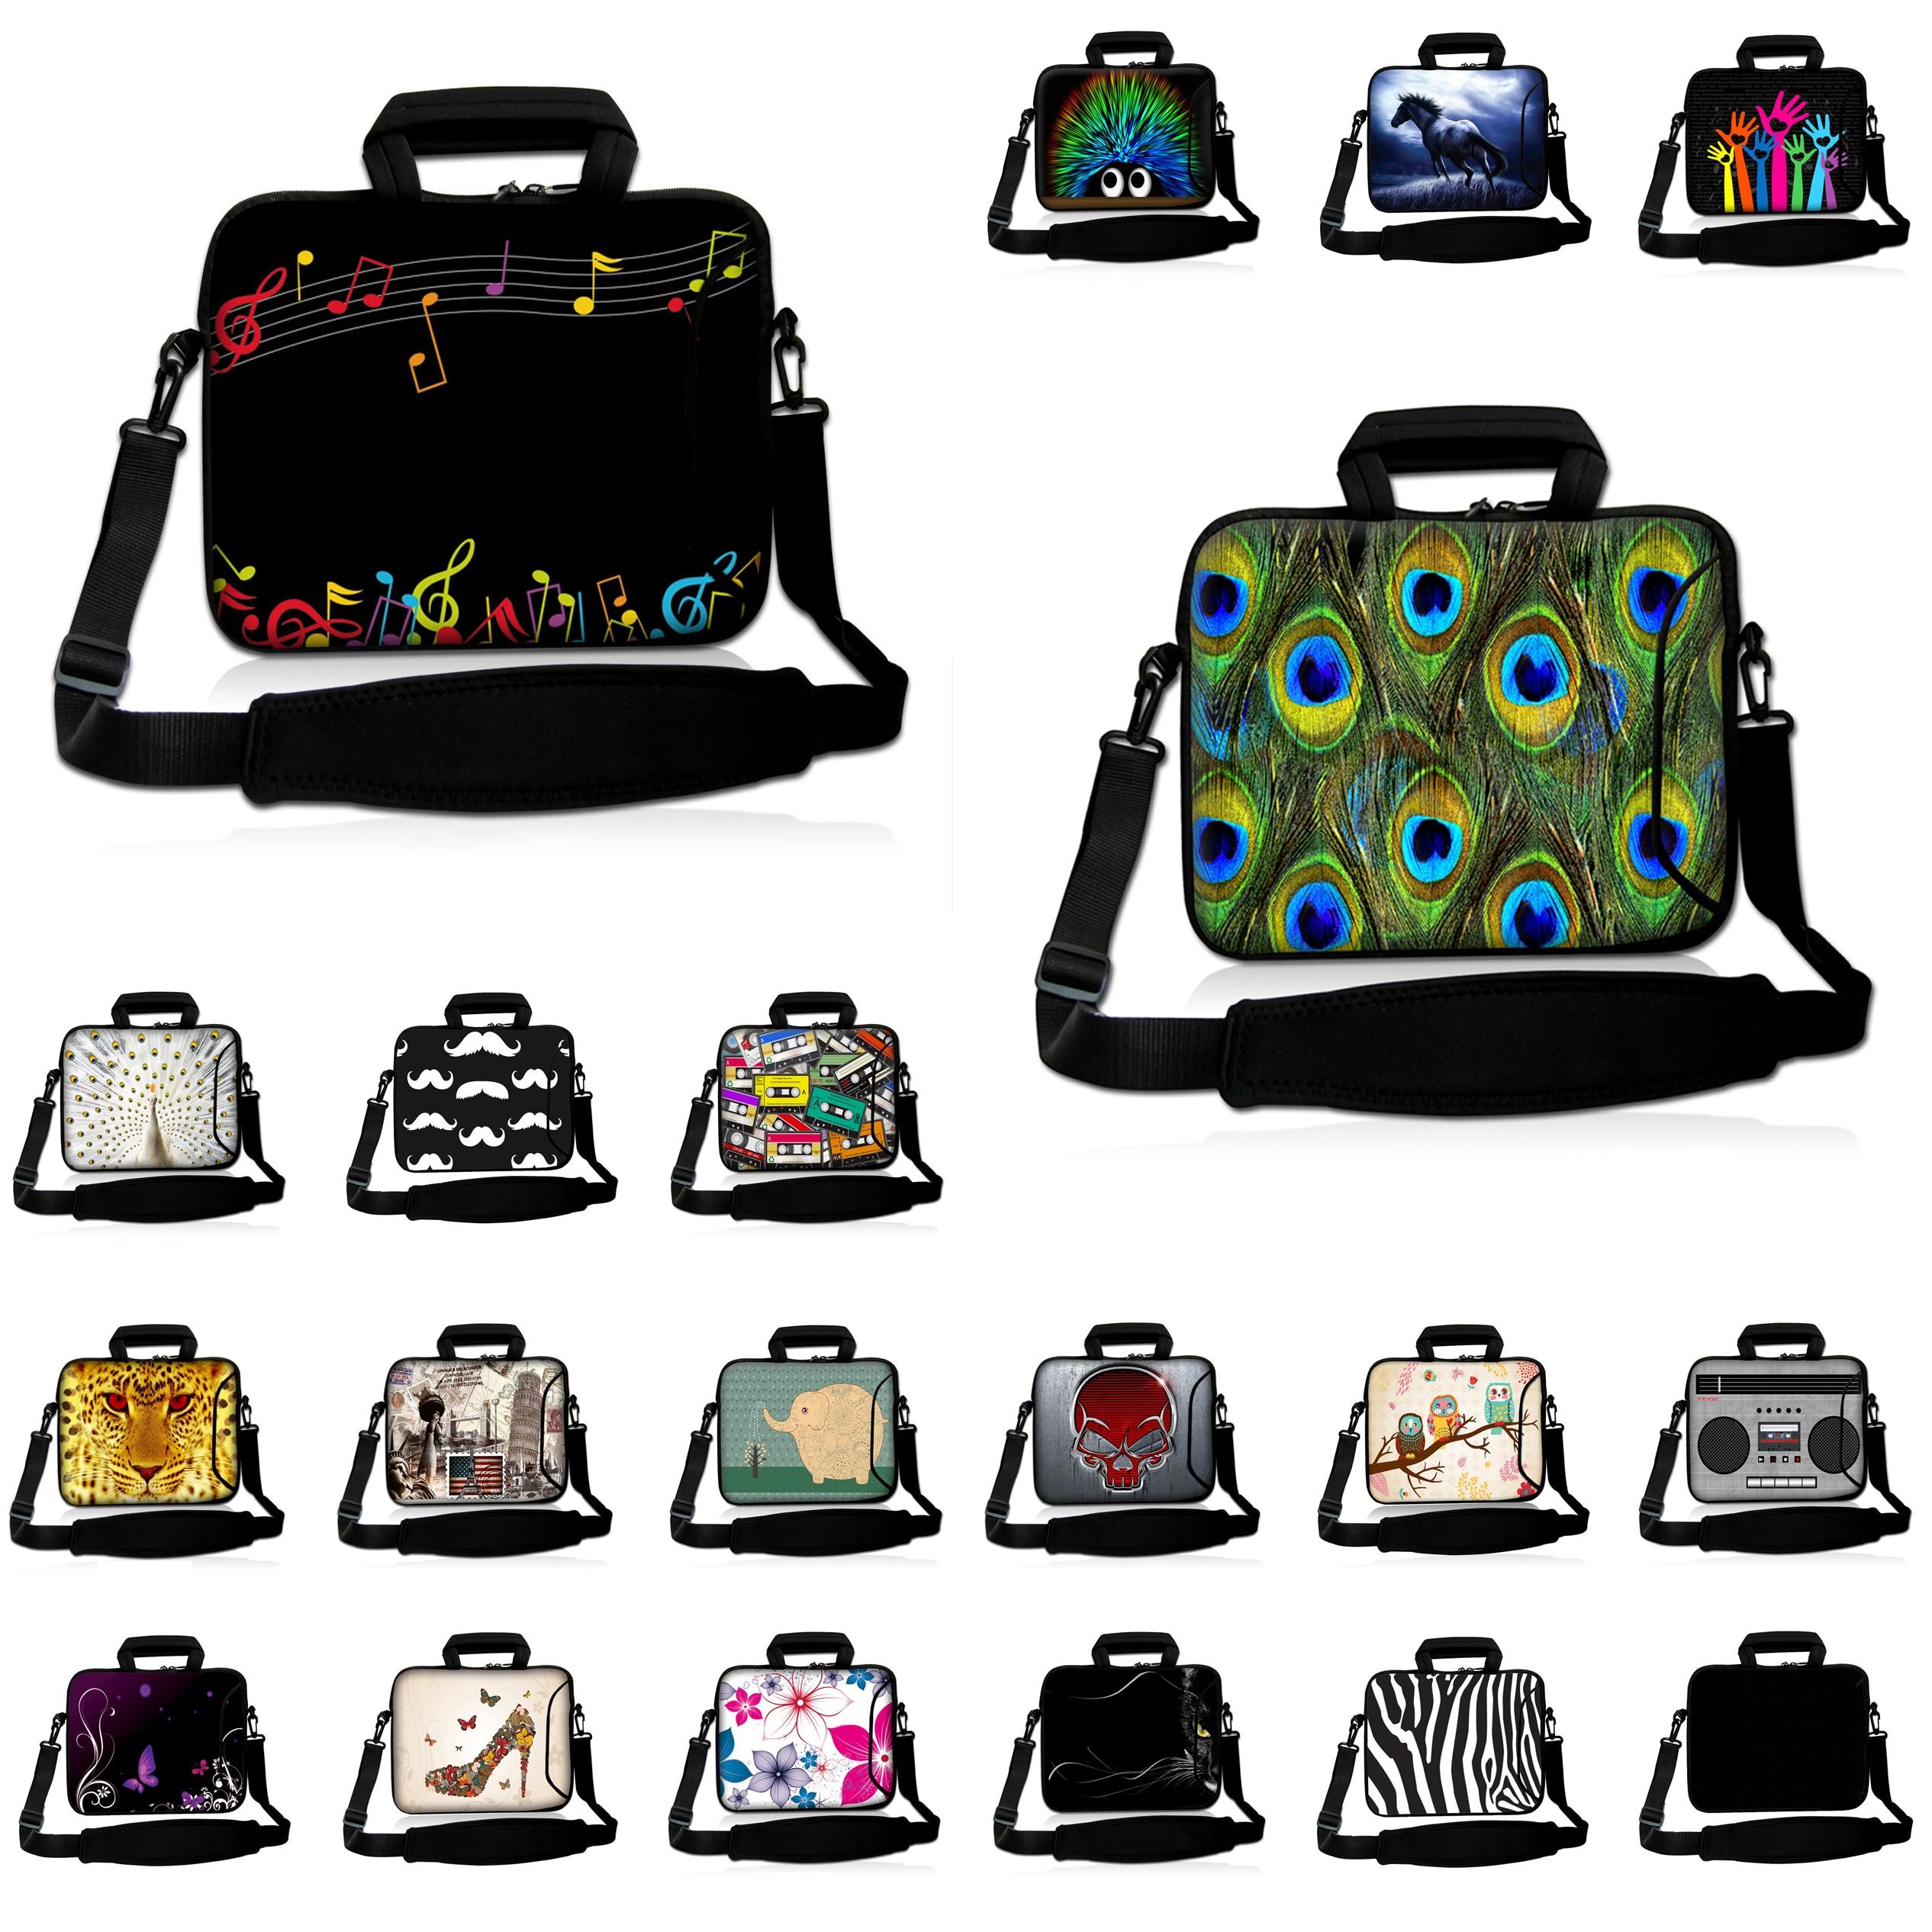 Waterproof Neoprene Briefcase Laptop Women Bag Tablet 10.1 9.7 Shoulder Bags For Huawei Chuwi Hi10 Samsung Lenovo Accessories